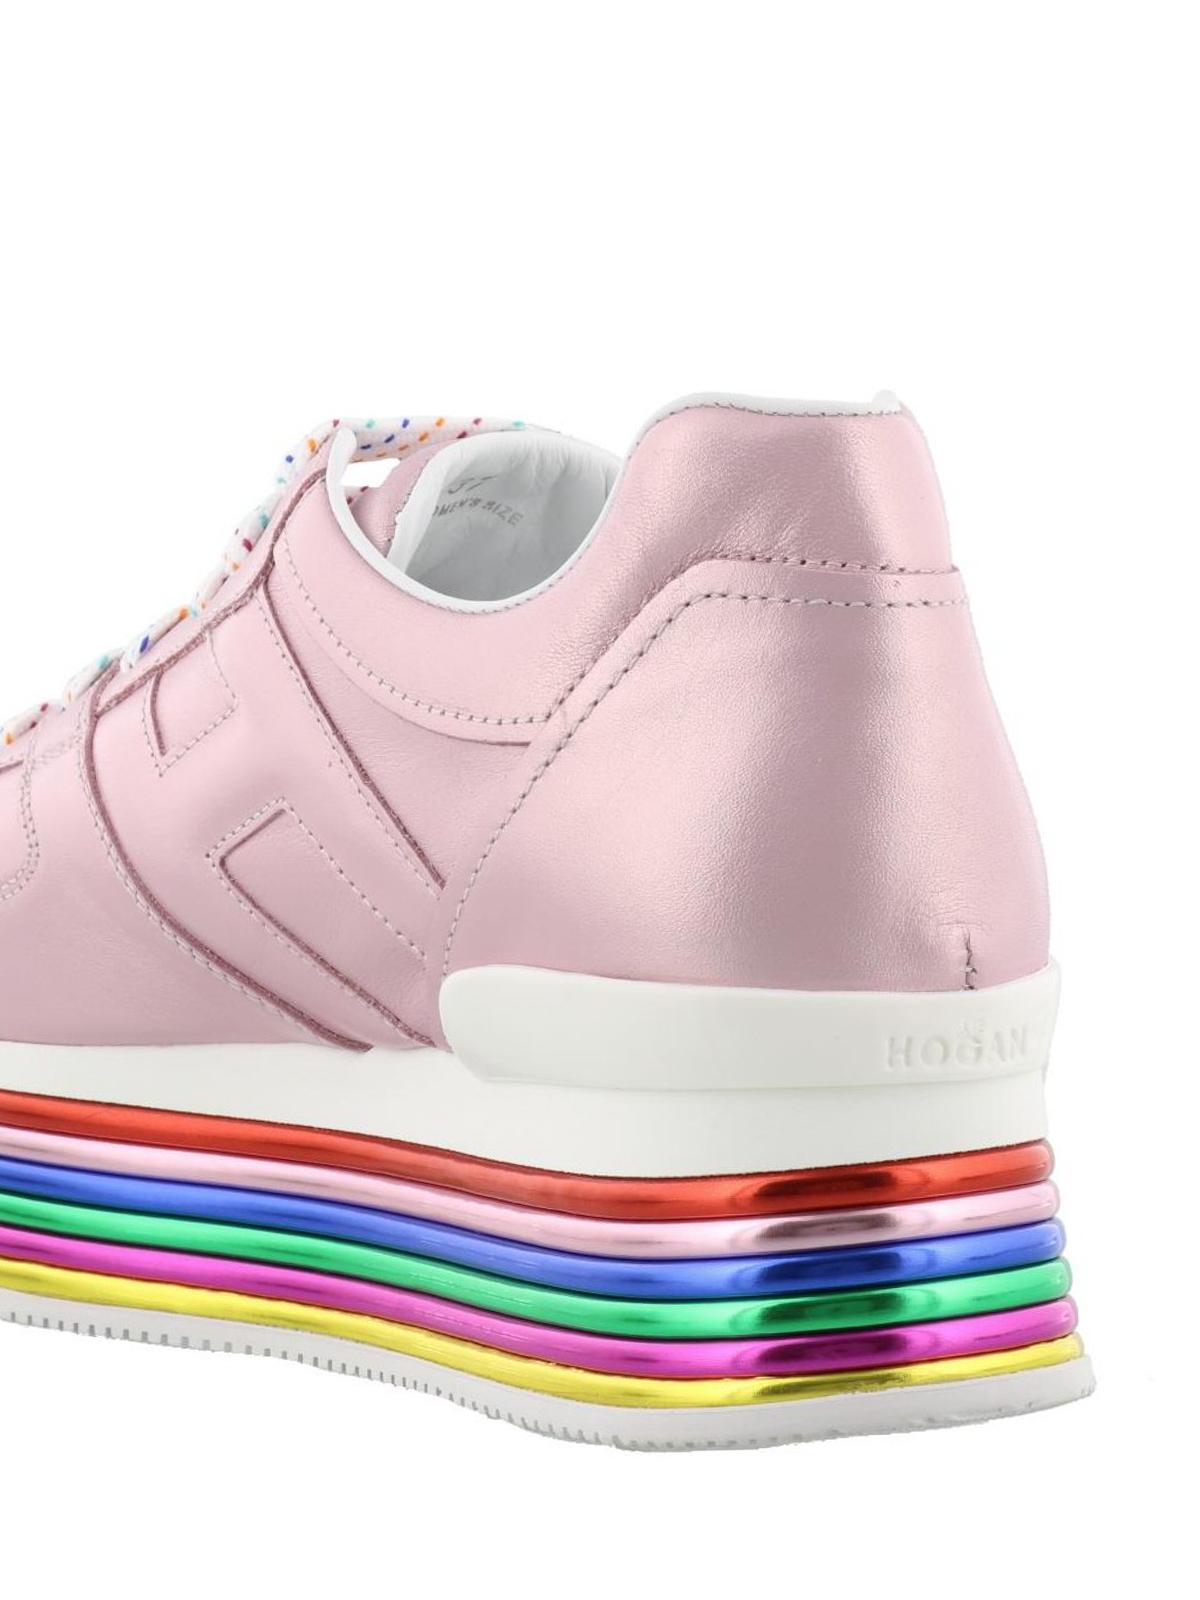 Sneakers Hogan - Sneaker Maxi H222 rosa laminato - GYW3520T548SV0M417